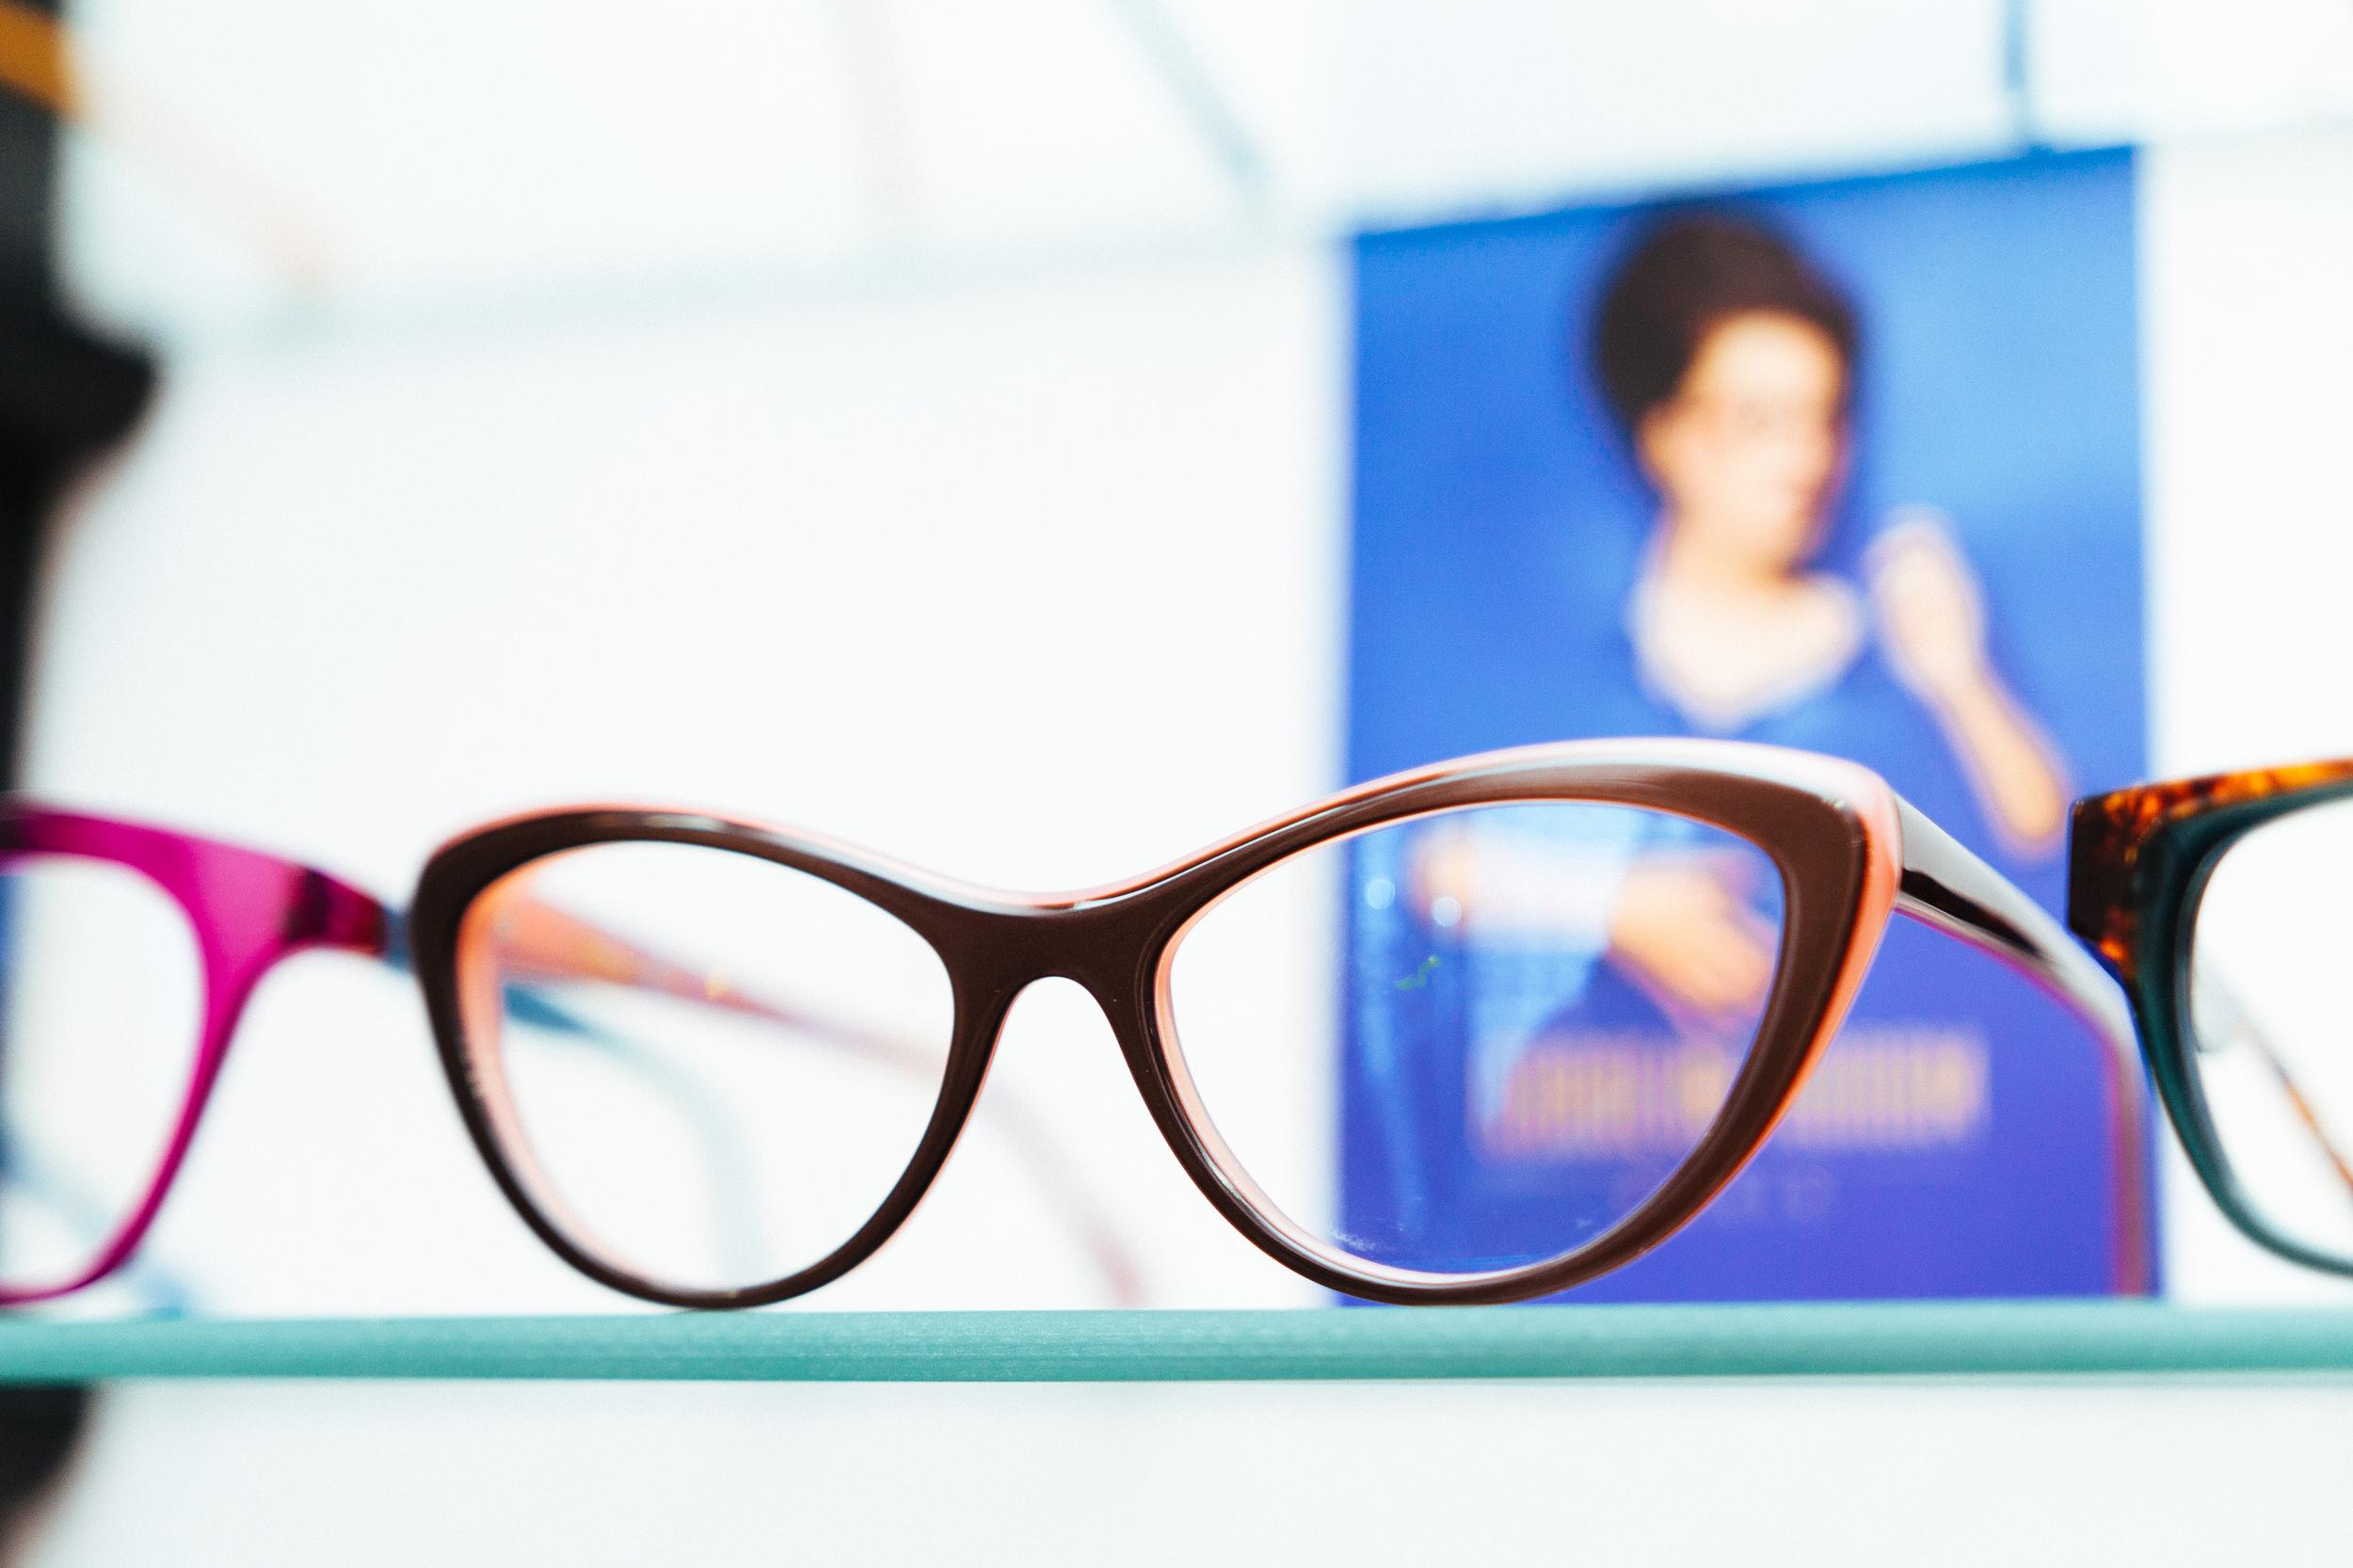 specsappeal15_0039.jpg